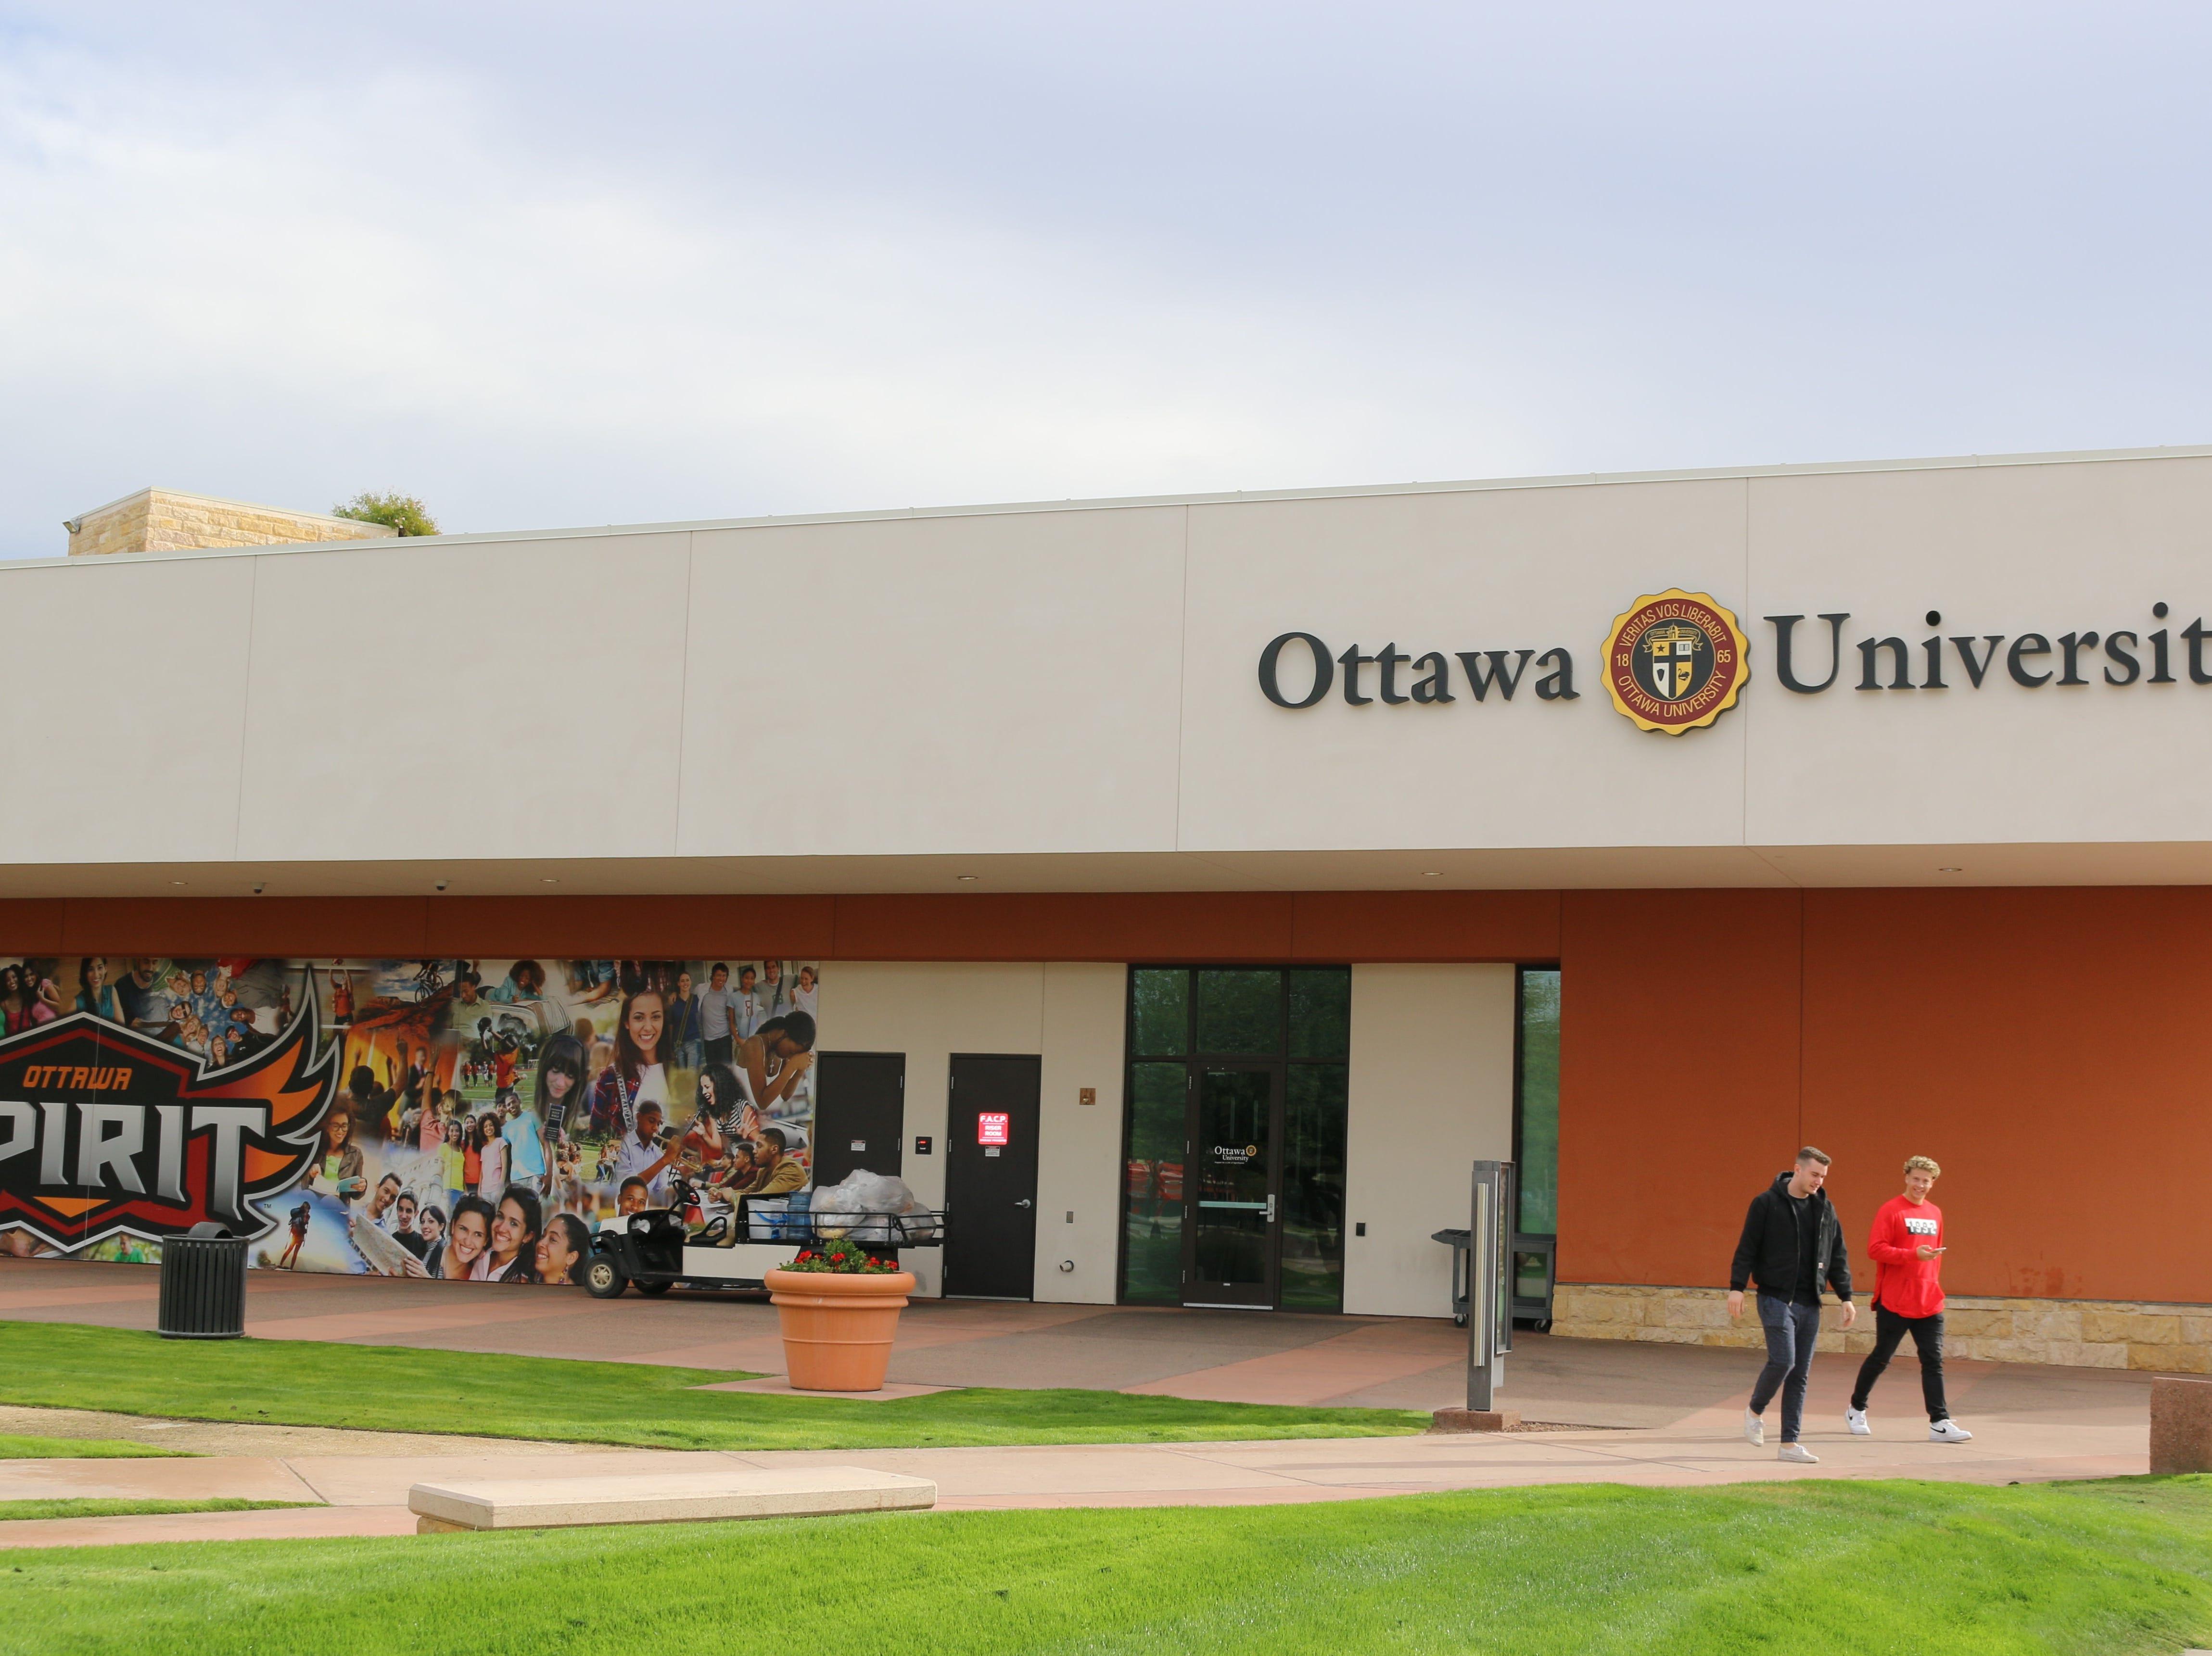 Ottawa University campus in Surprise.